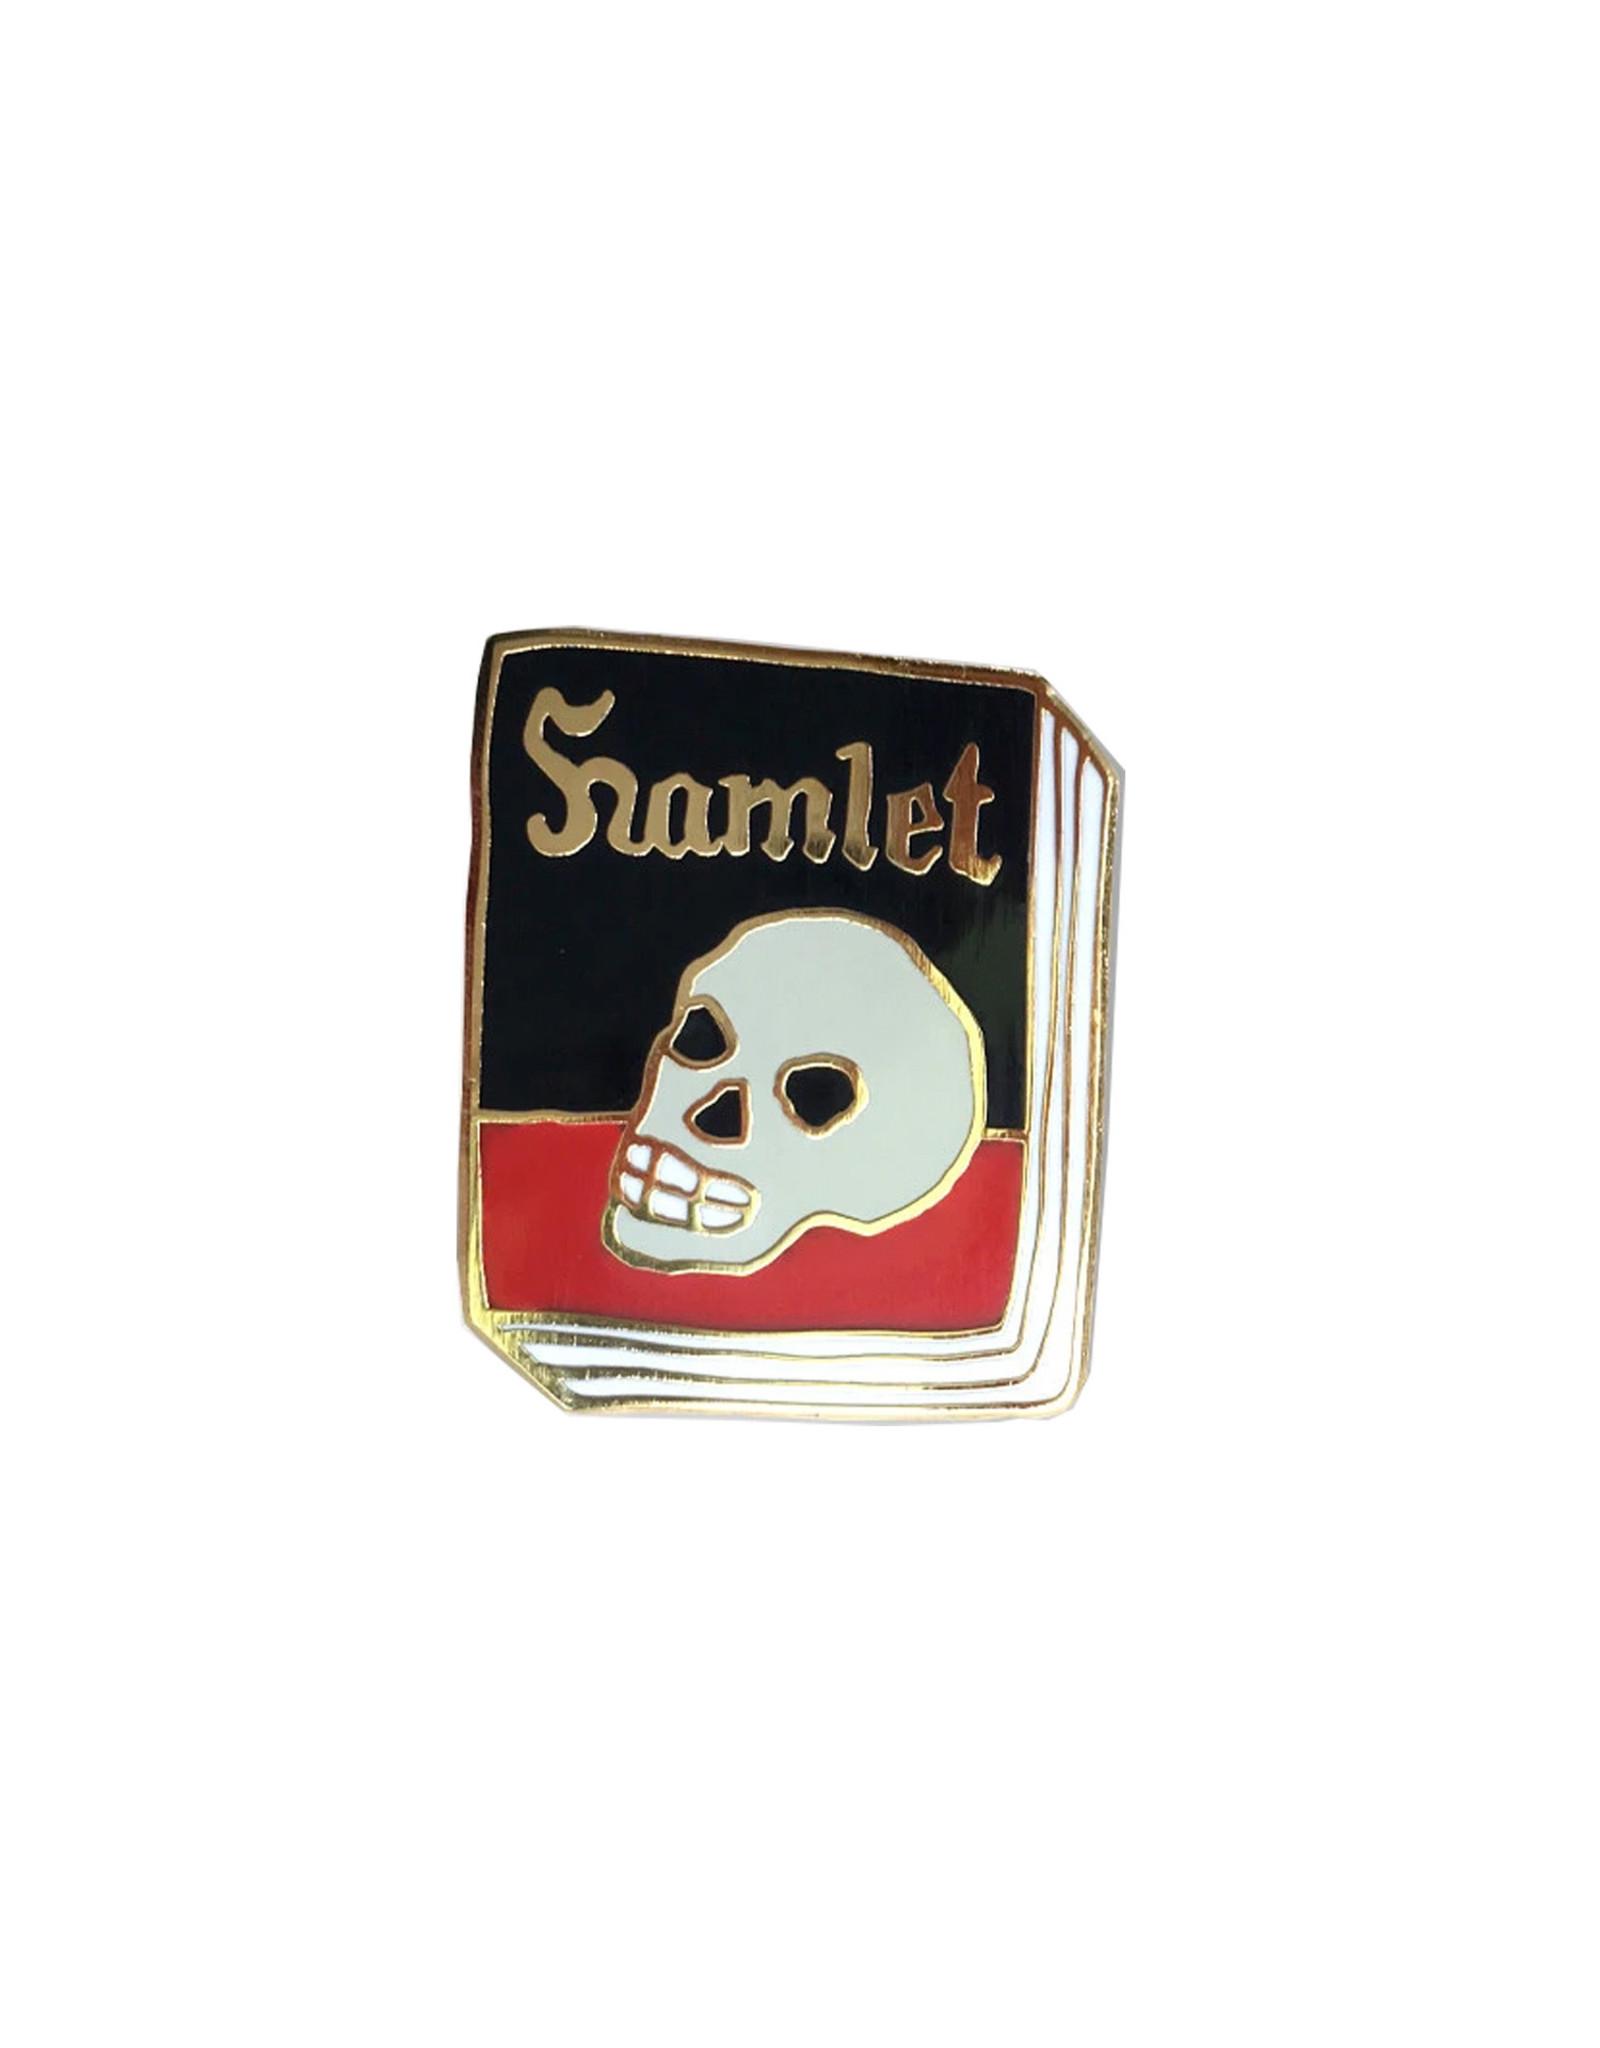 Ideal Bookshelf Book Pin: Hamlet